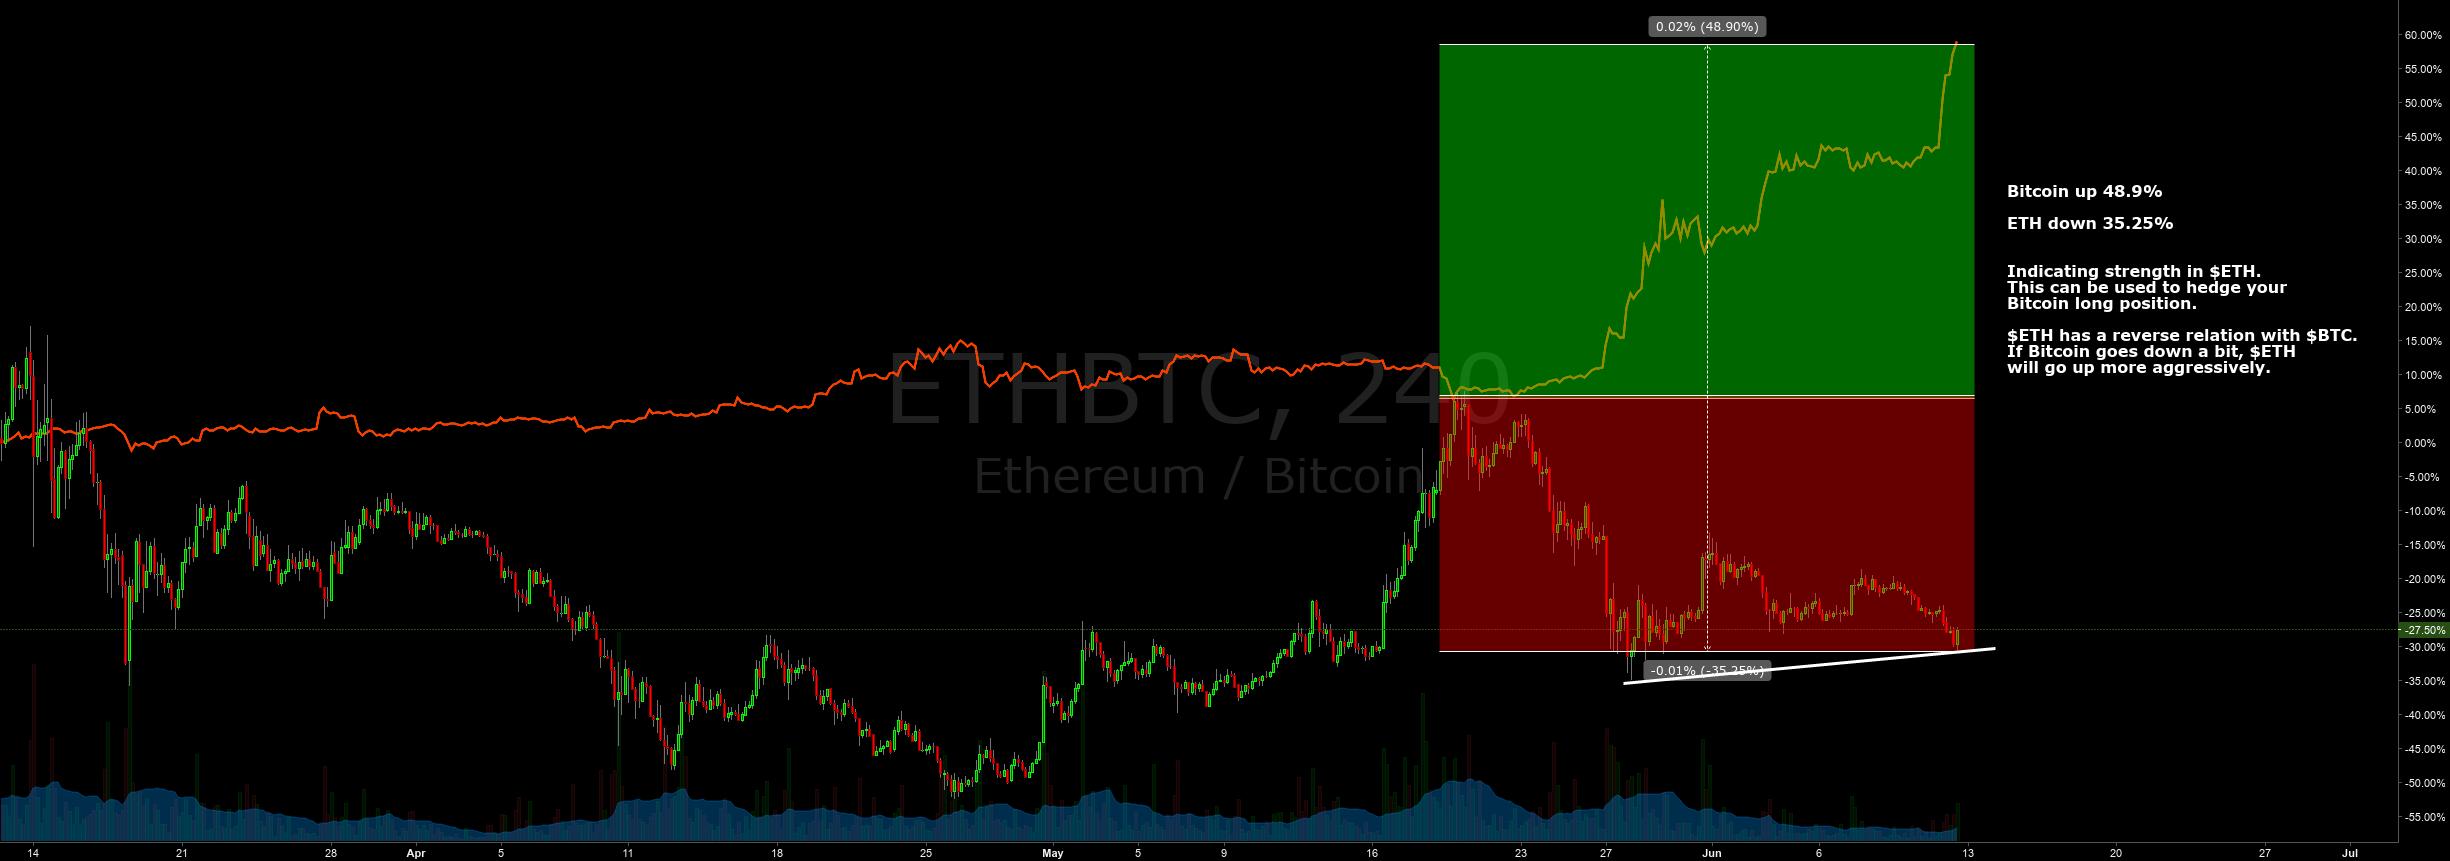 $ETHBTC and Bitcoin Hedge